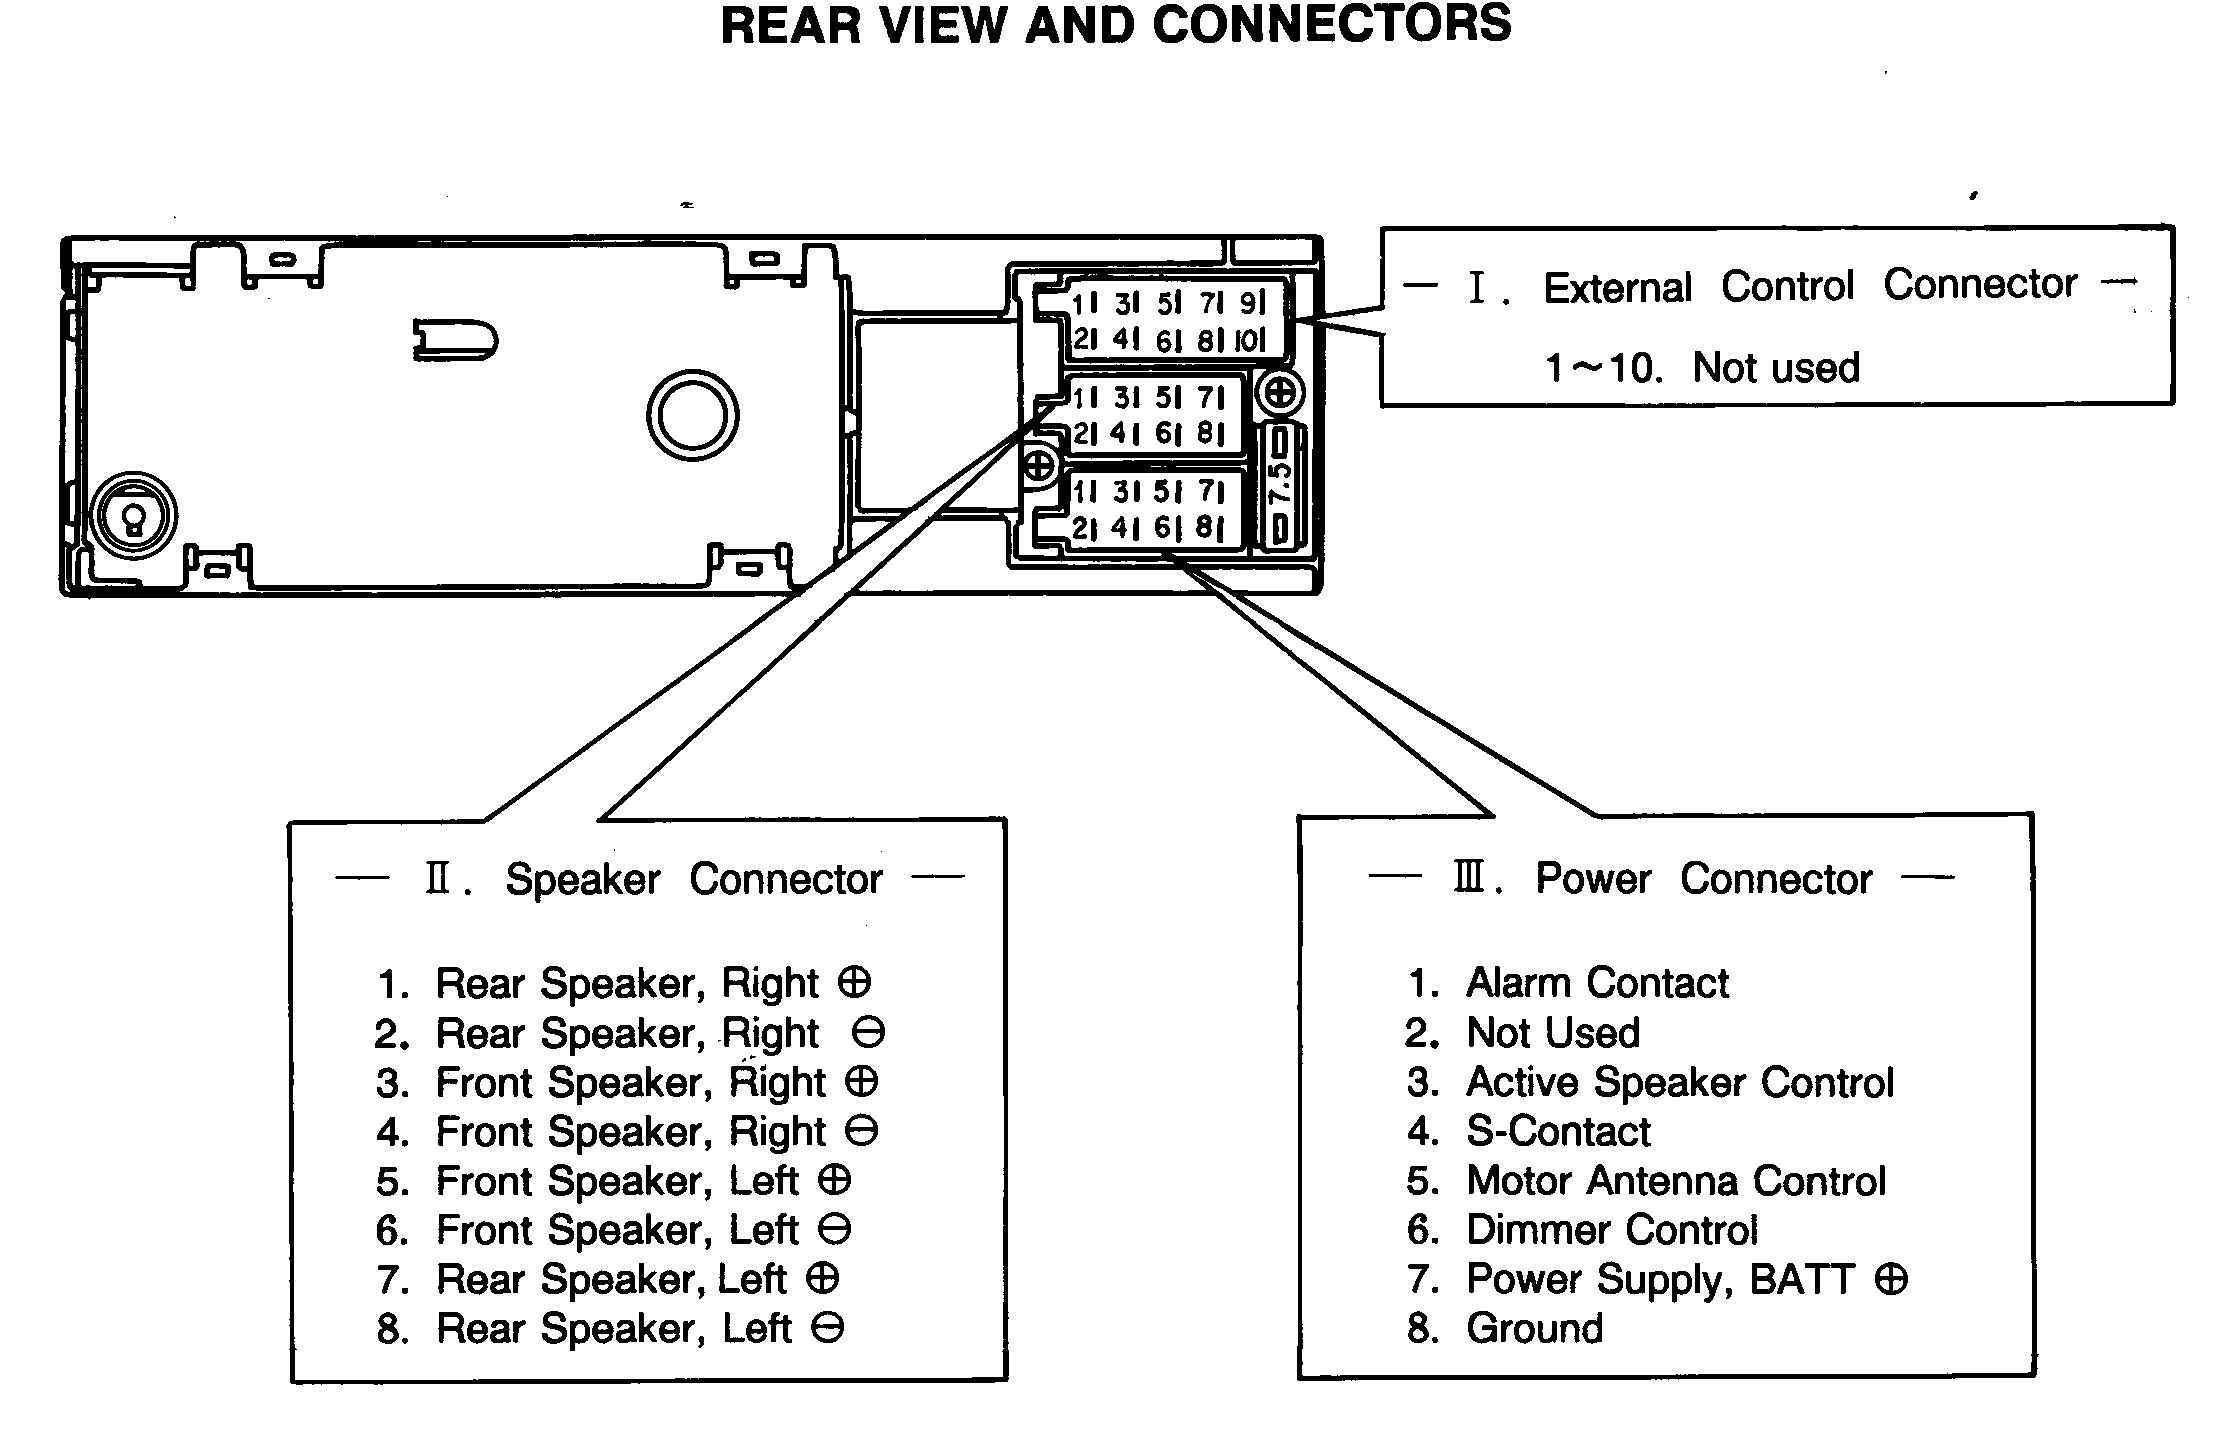 Wiring Diagram for Car Audio Honda Stereo Wiring Diagram Blurts Of Wiring Diagram for Car Audio